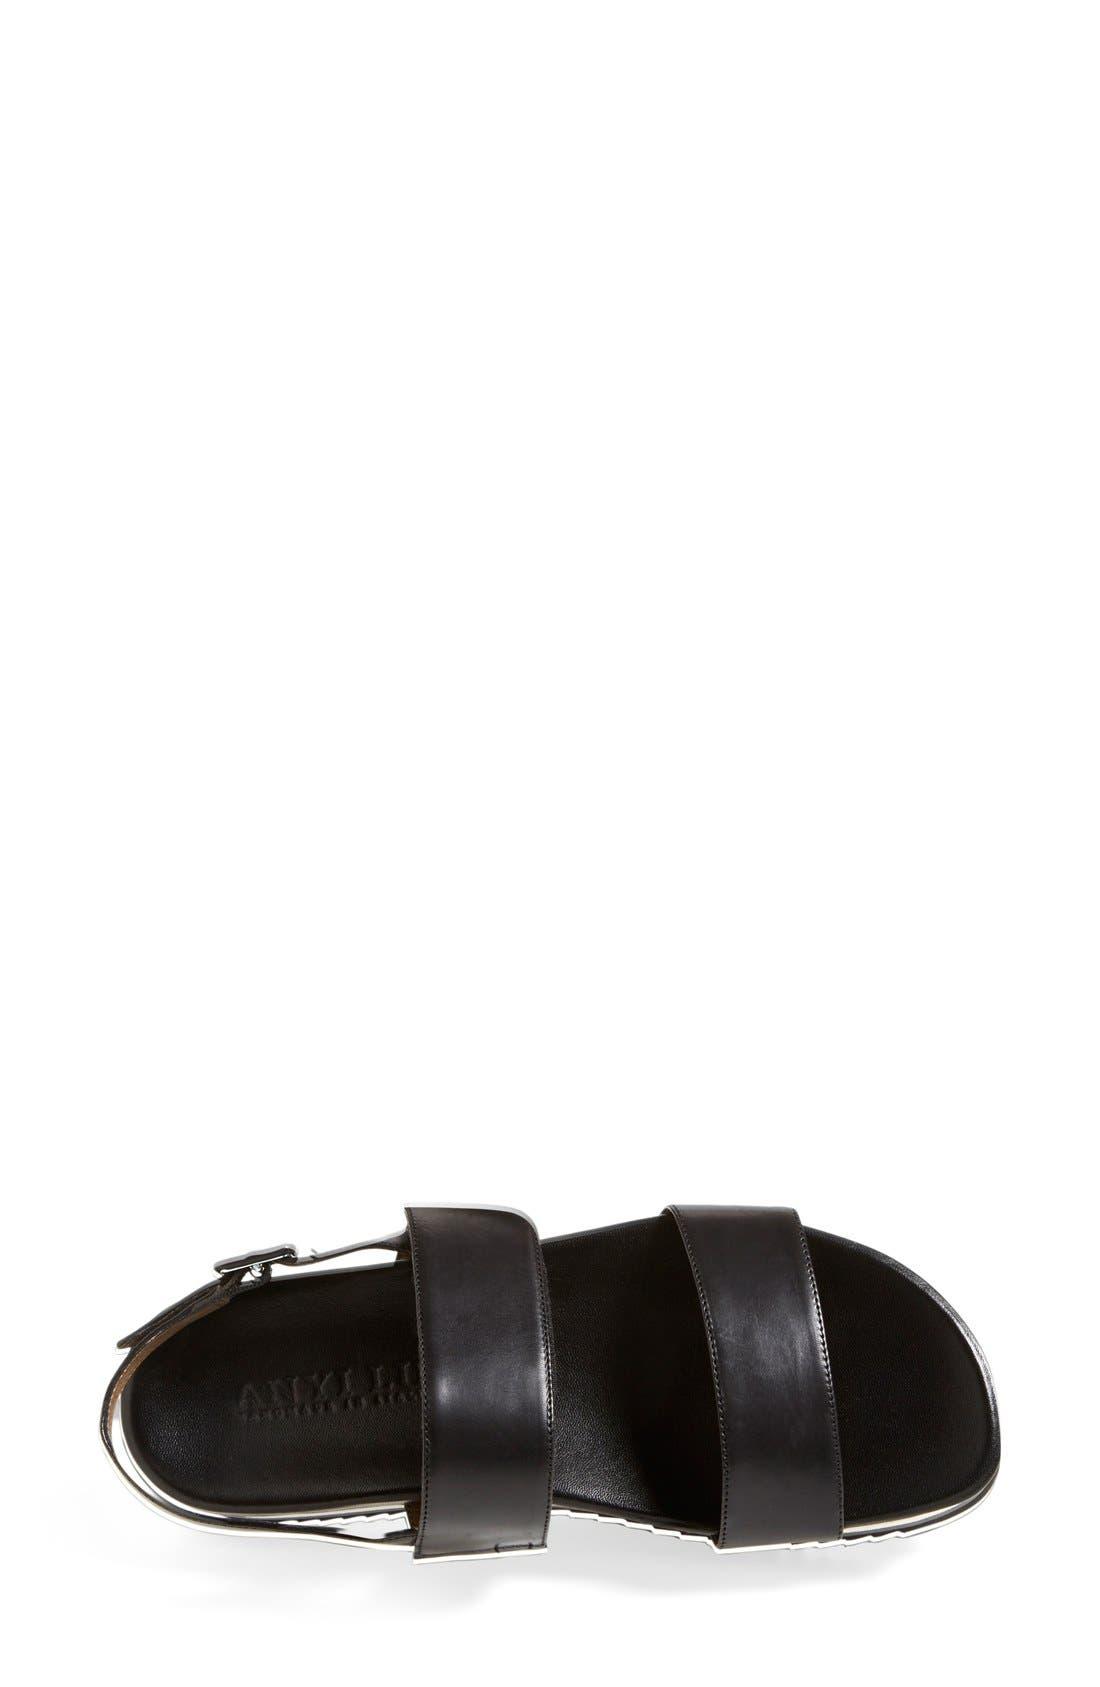 Alternate Image 3  - Anyi Lu 'Viva' Leather Platform Sandal (Women)